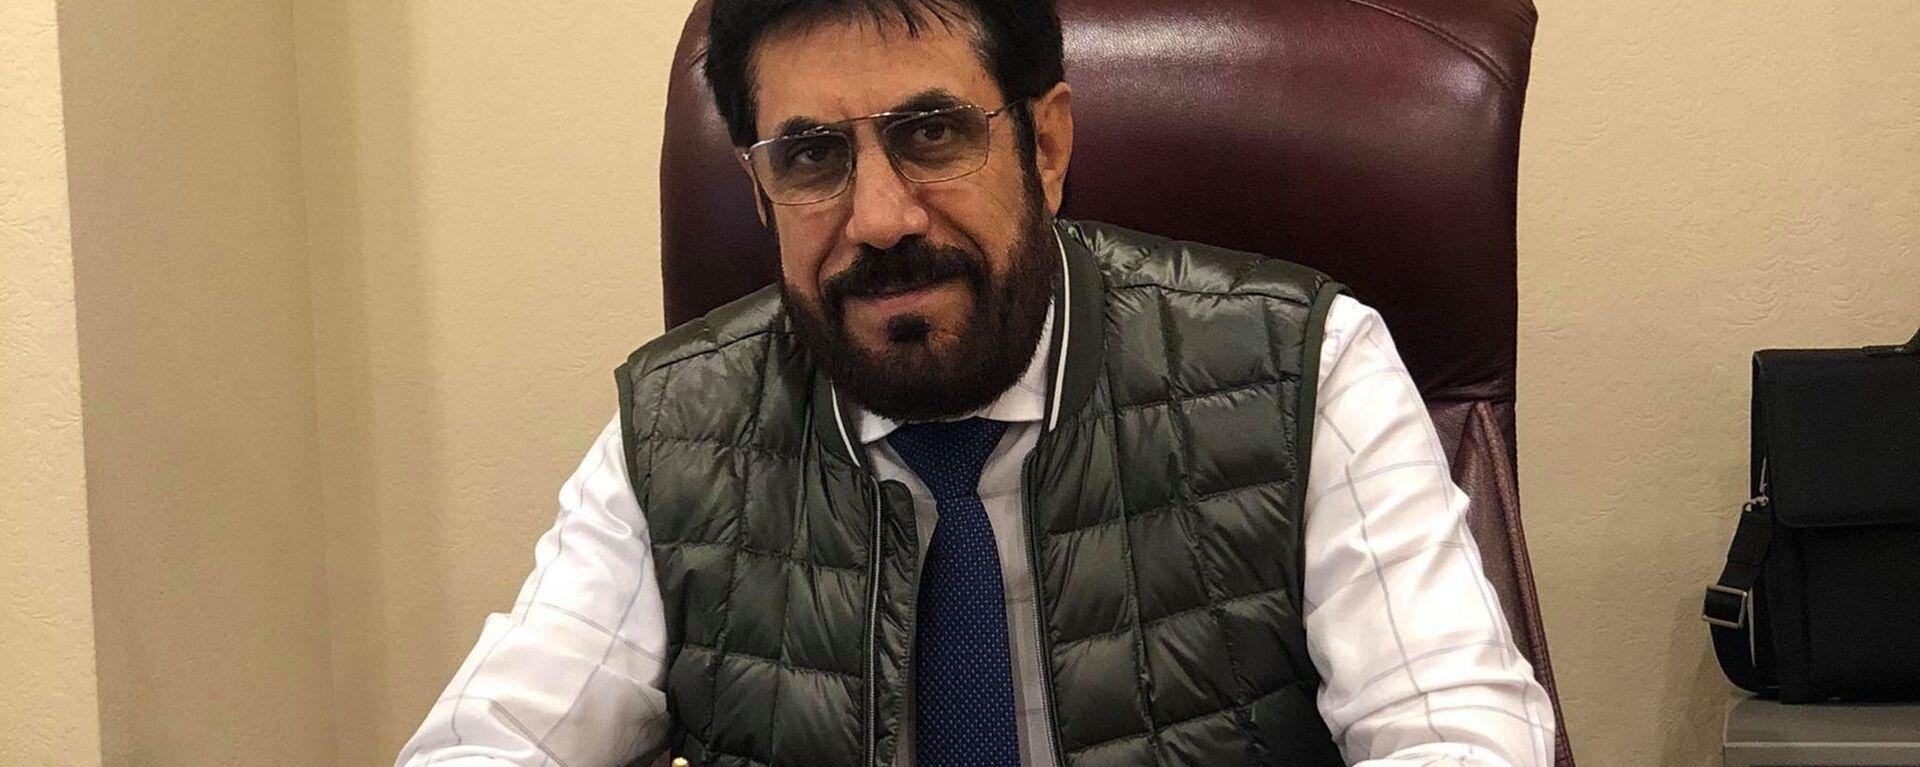 Prezes Centrum Diaspory Afganistanu w Rosji Gulam Mohammad Jalal - Sputnik Polska, 1920, 01.10.2021